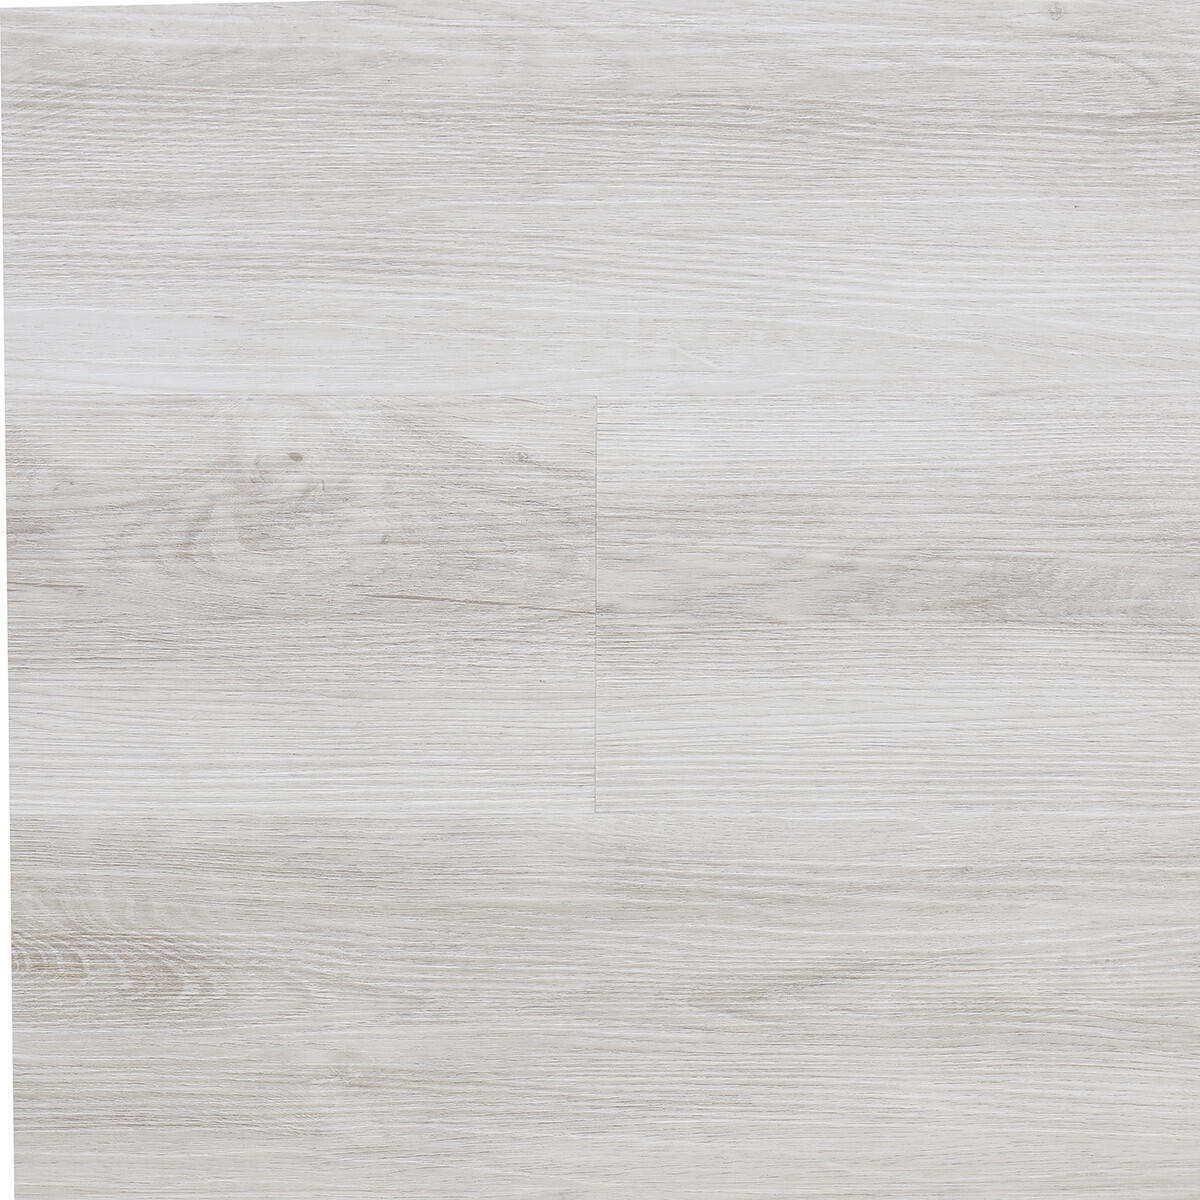 Pavimento SPC flottante clic+ Davos Sp 5 mm bianco - 4